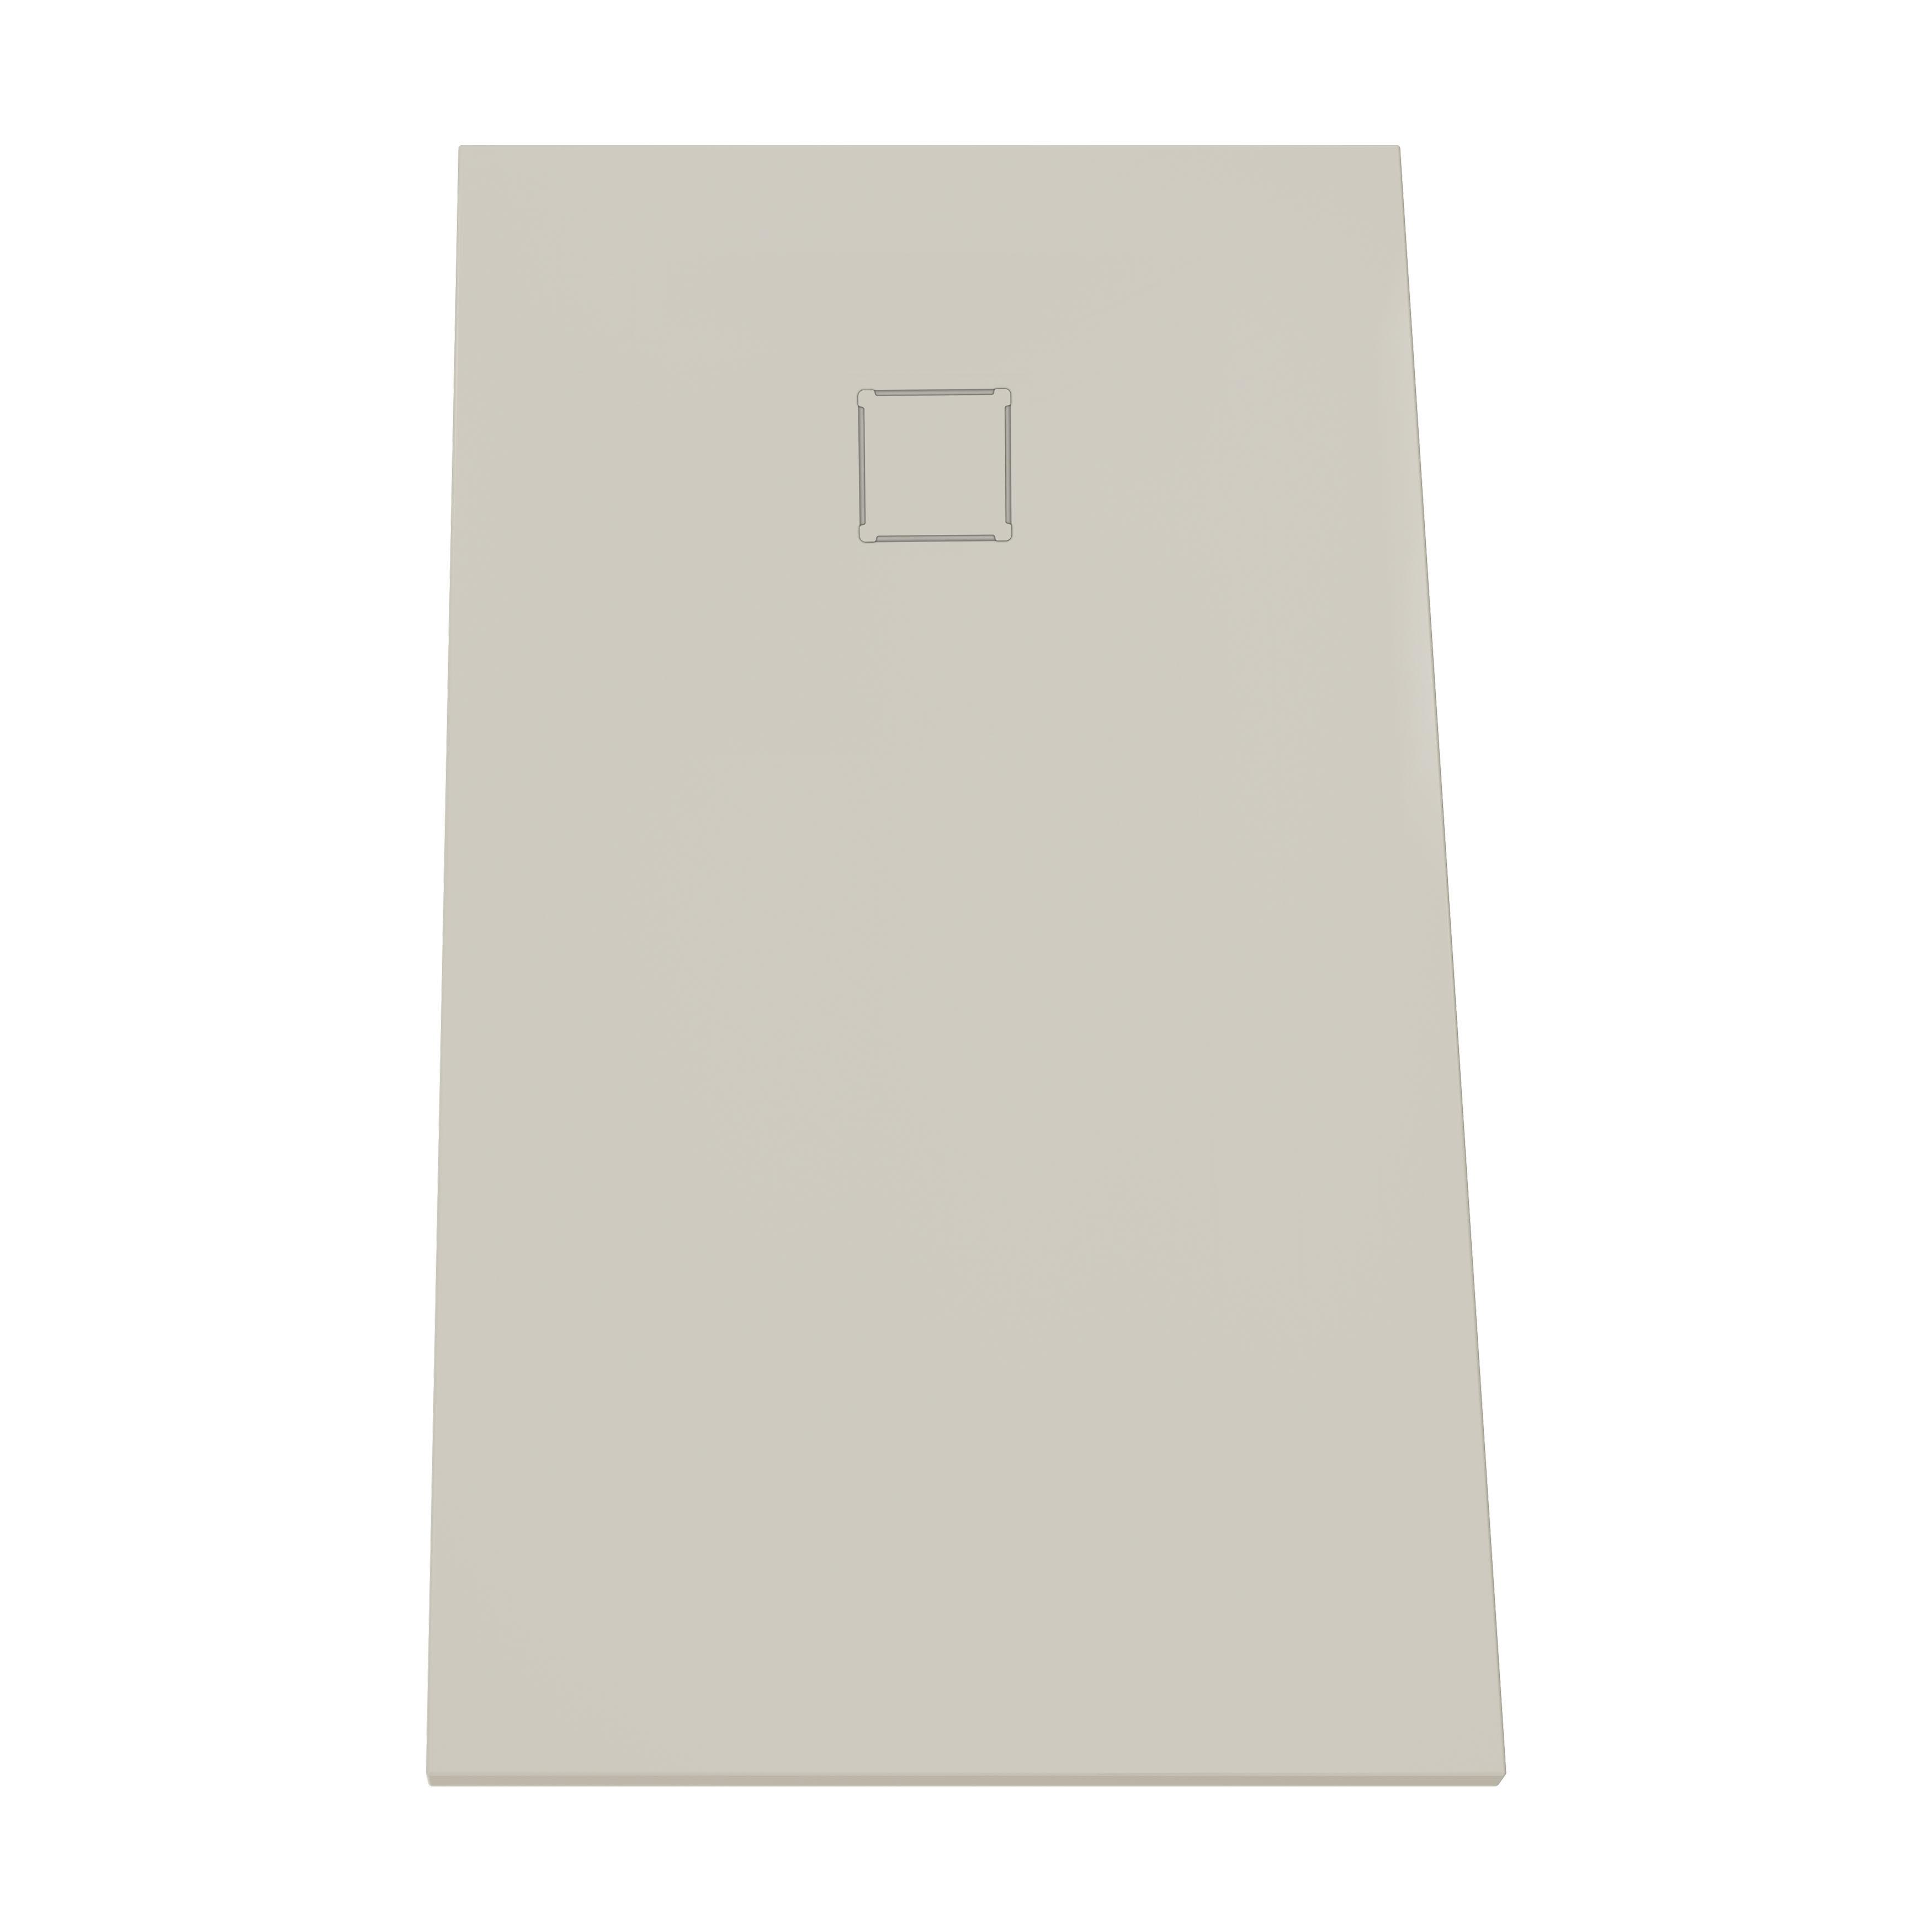 V-stone, receveur ultra plat en solid stone, 160  x  80 cm, taupe